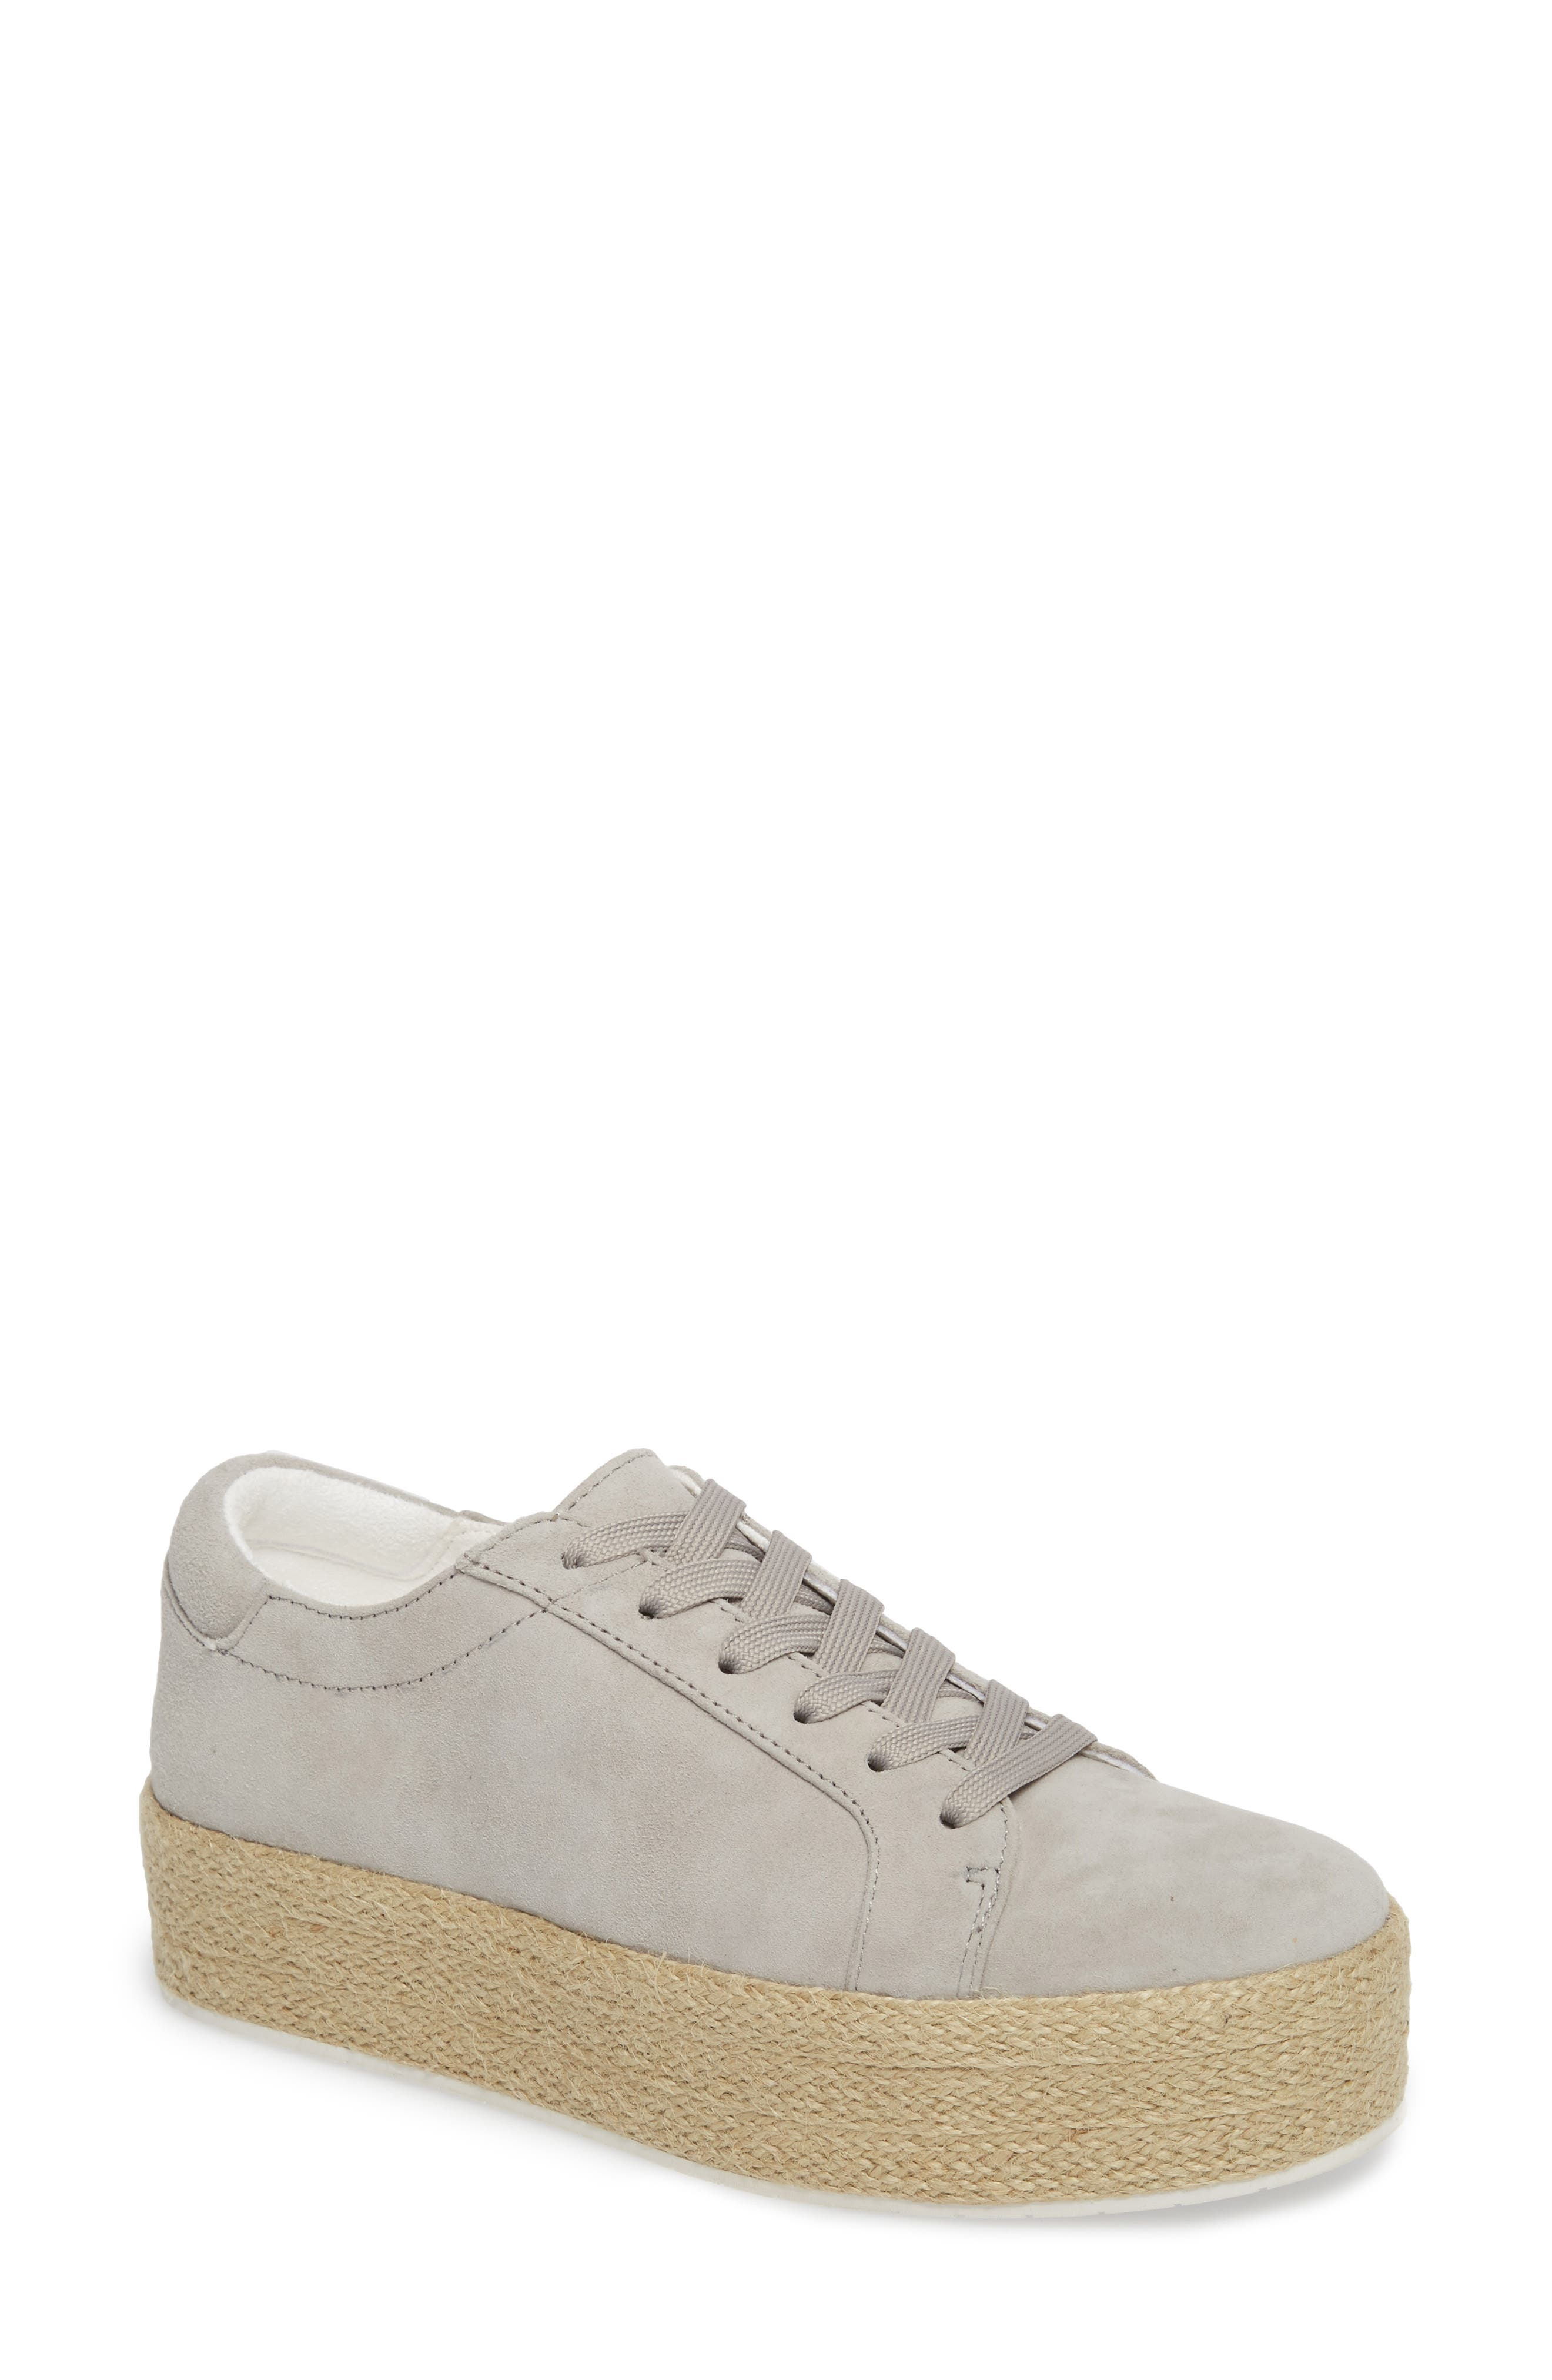 Allyson Espadrille Platform Sneaker,                         Main,                         color,